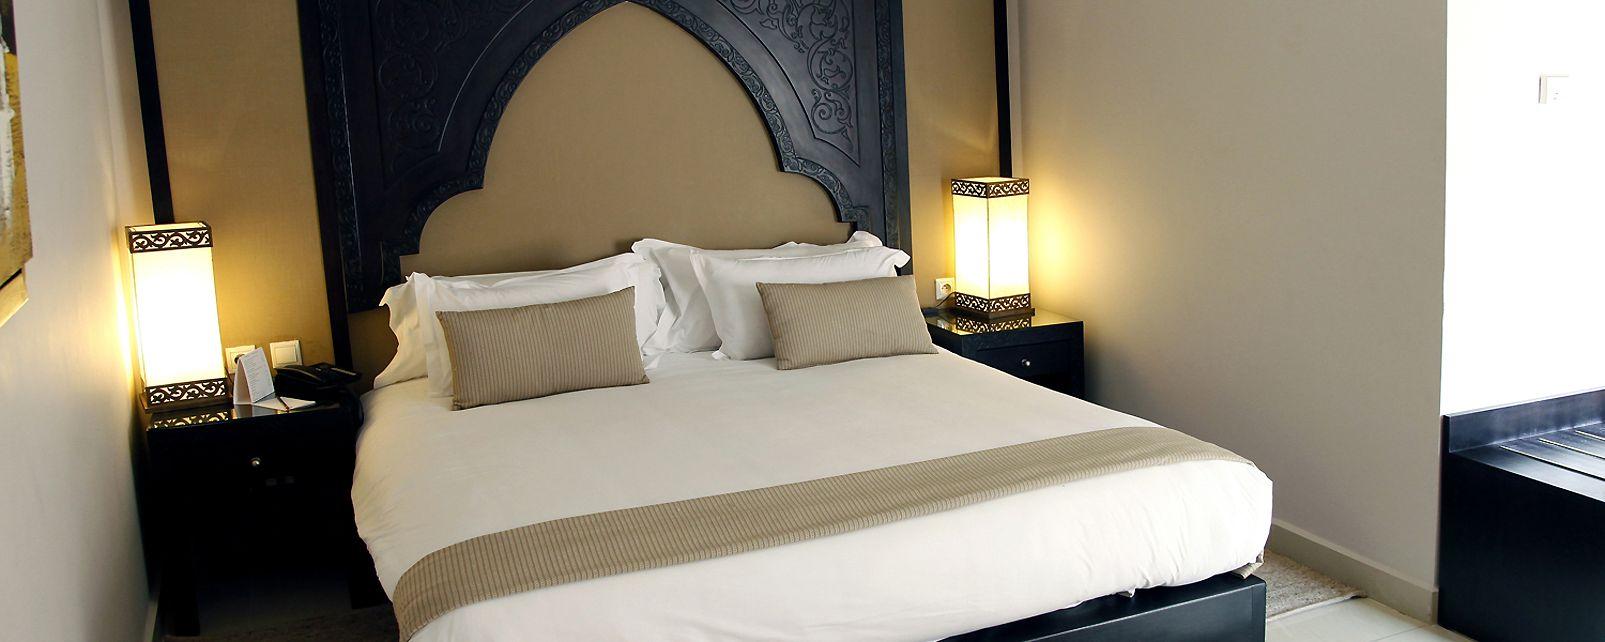 Hôtel Opera Plaza Hotel Marrakech